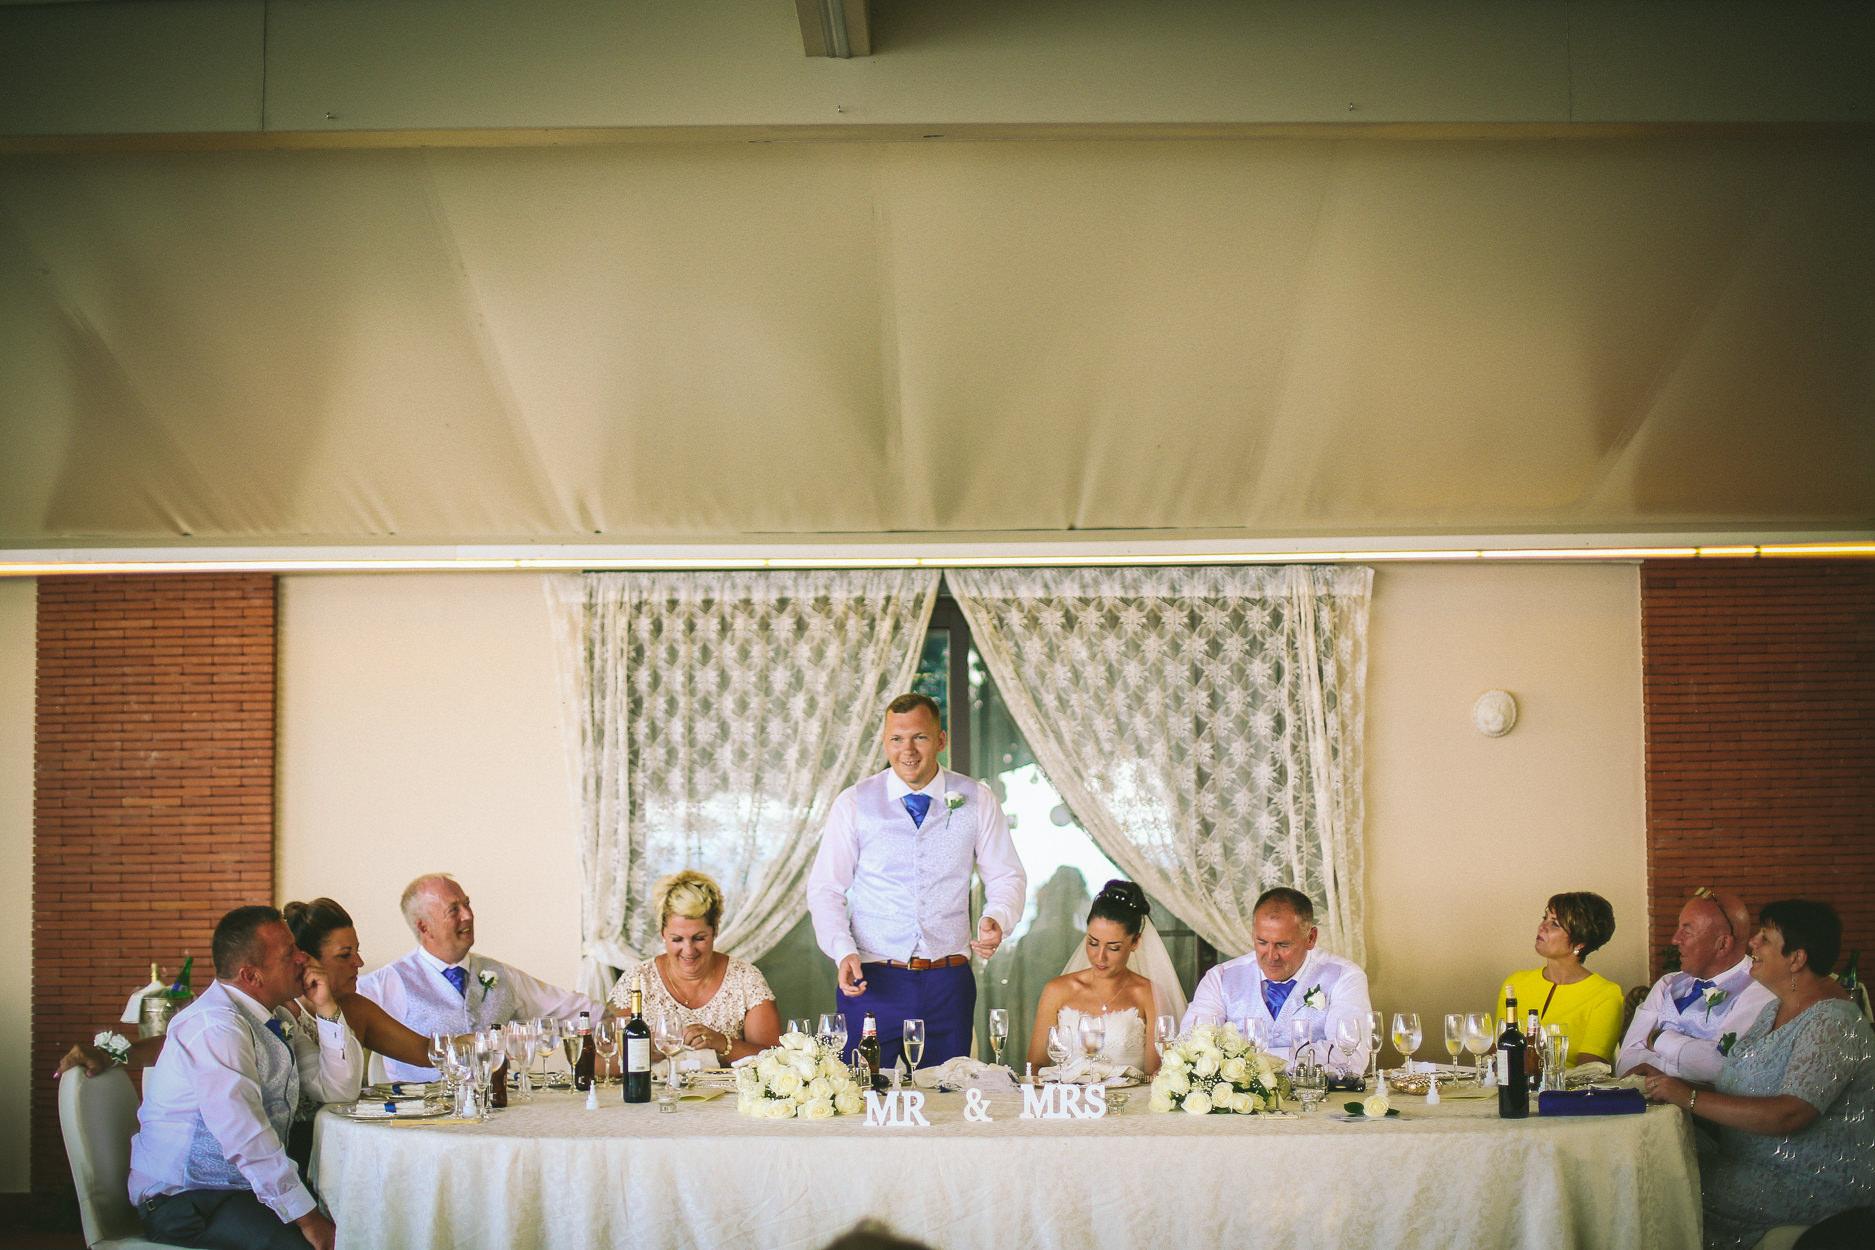 Amalfi-Coast-wedding-venue-Wedding-Photography-Villa Antiche Mura-Sorrento-Italy-12